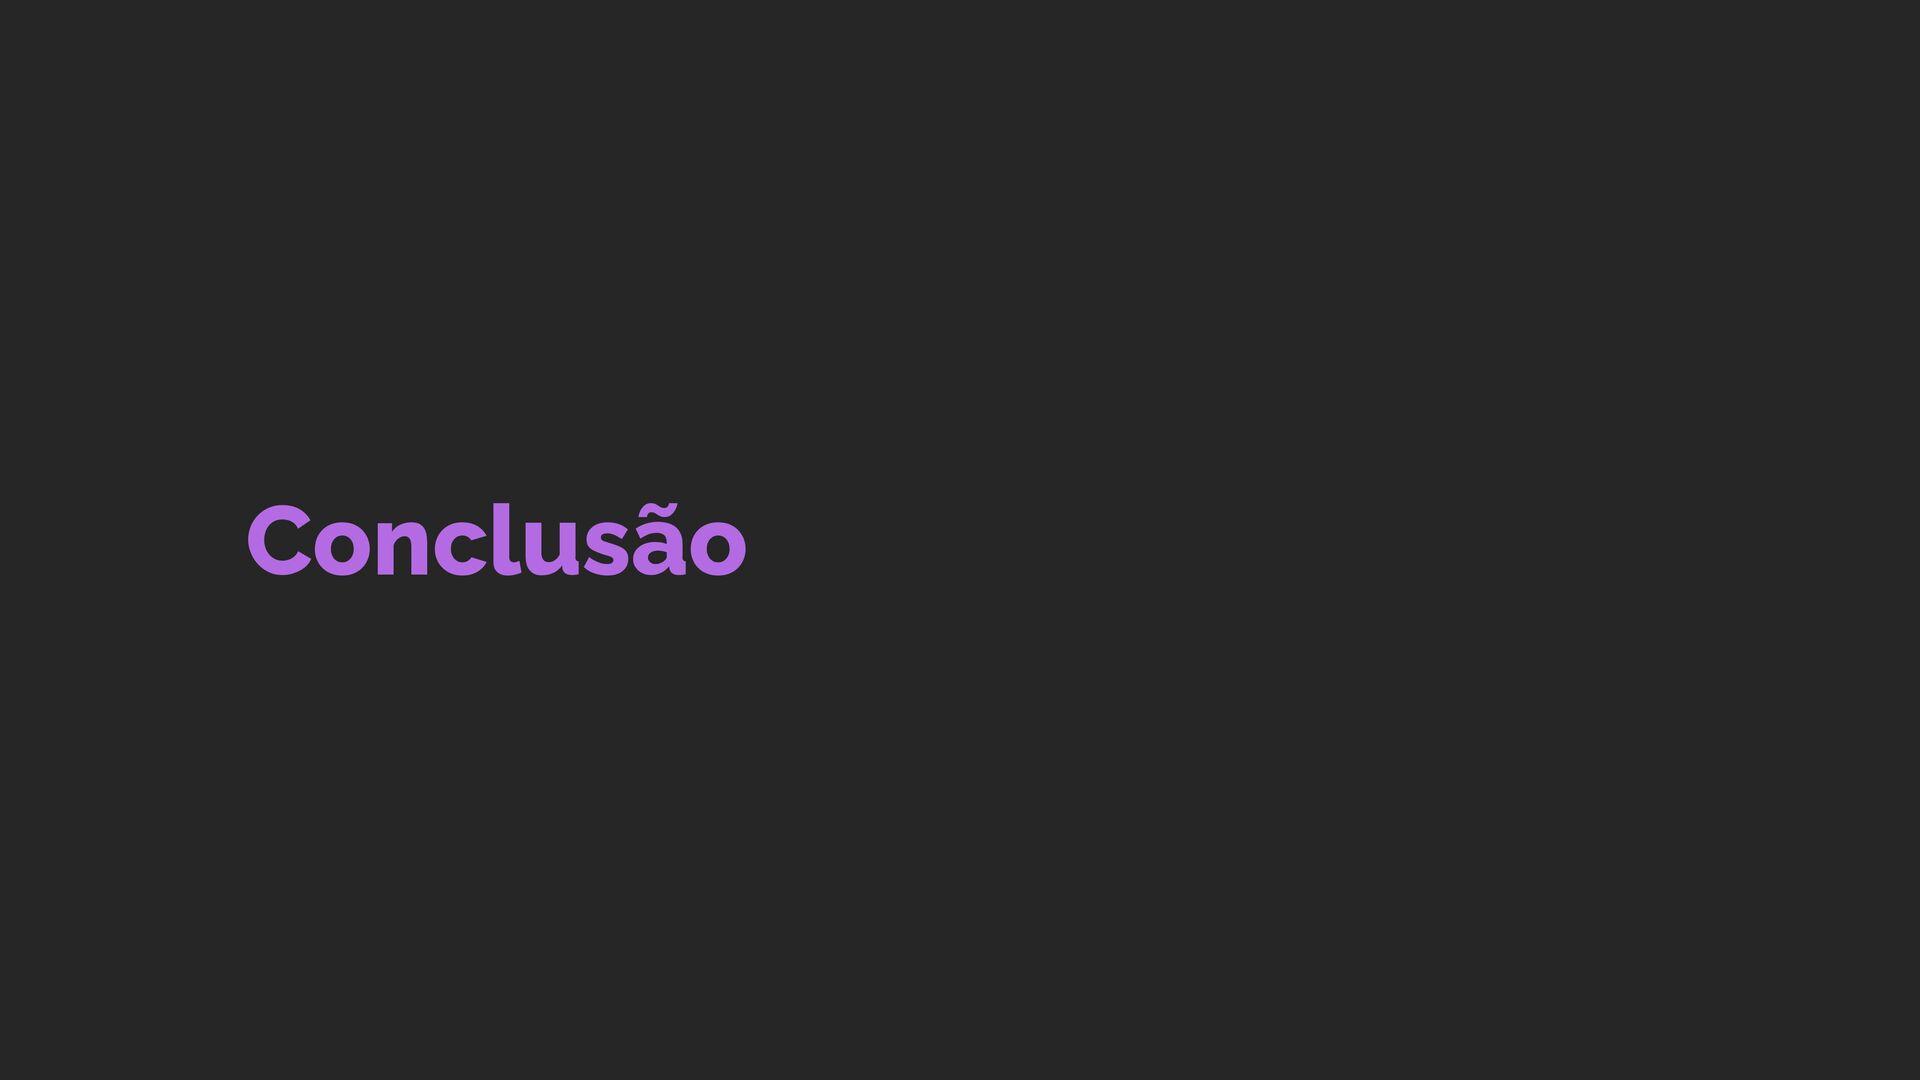 bit.ly/palestra-arquitetura-de-software